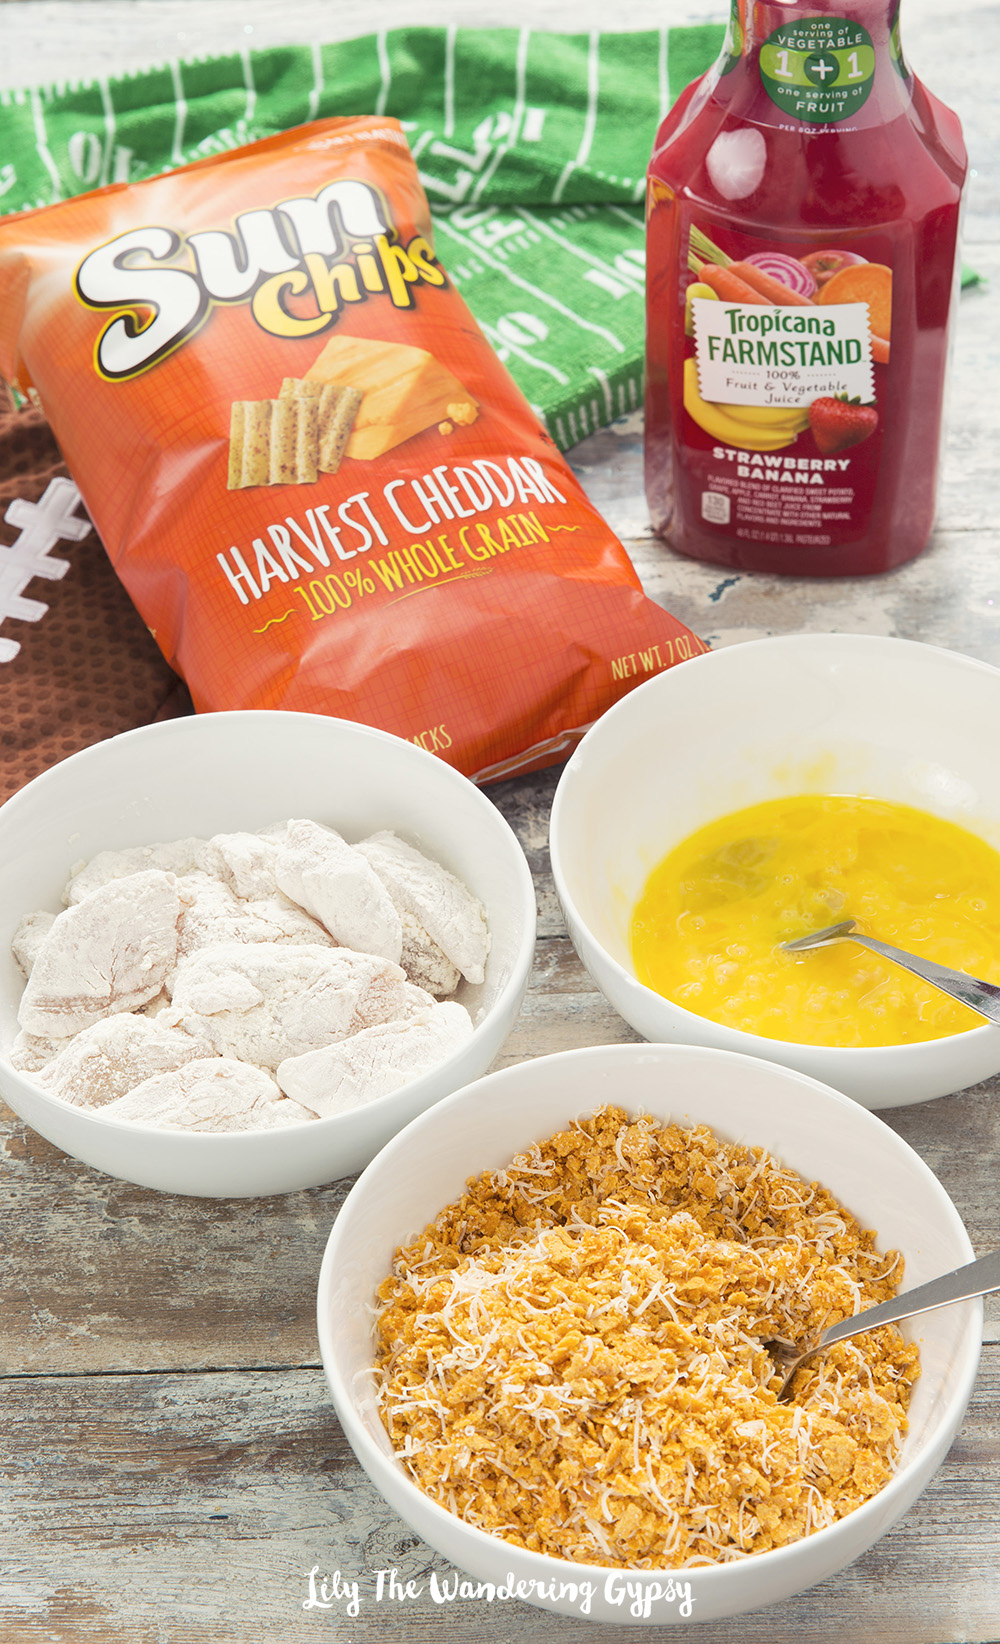 Sun Chips Popcorn Chicken + Tropicana Dipping Sauce #GameDayGrubMatchEntry